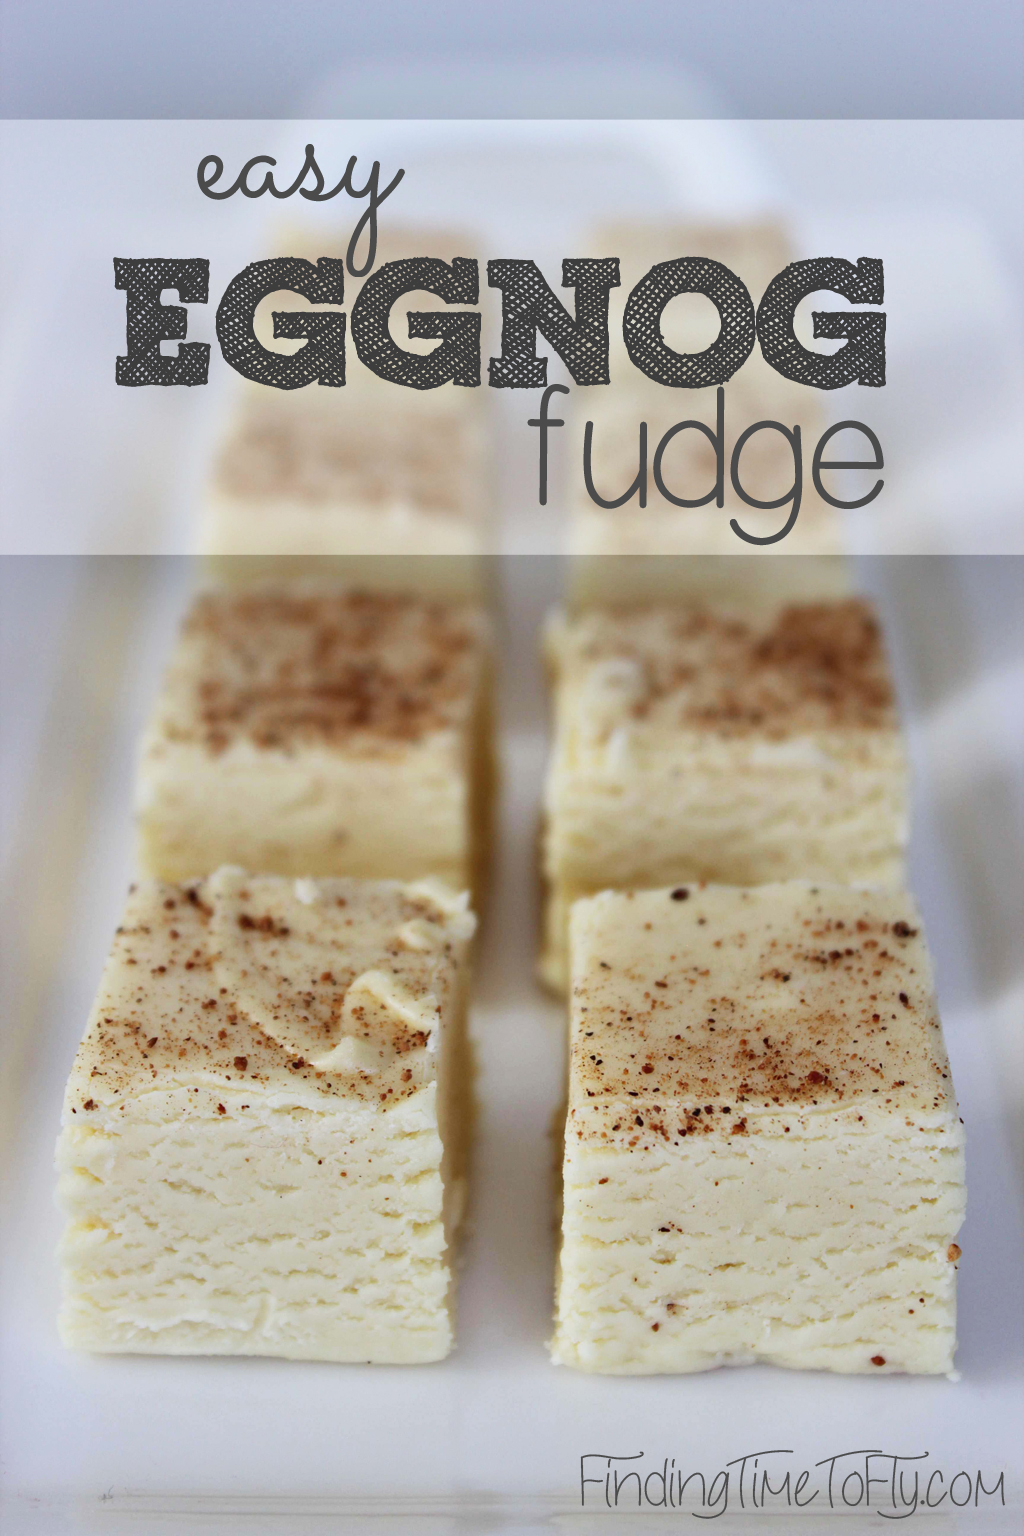 Easy Eggnog Fudge